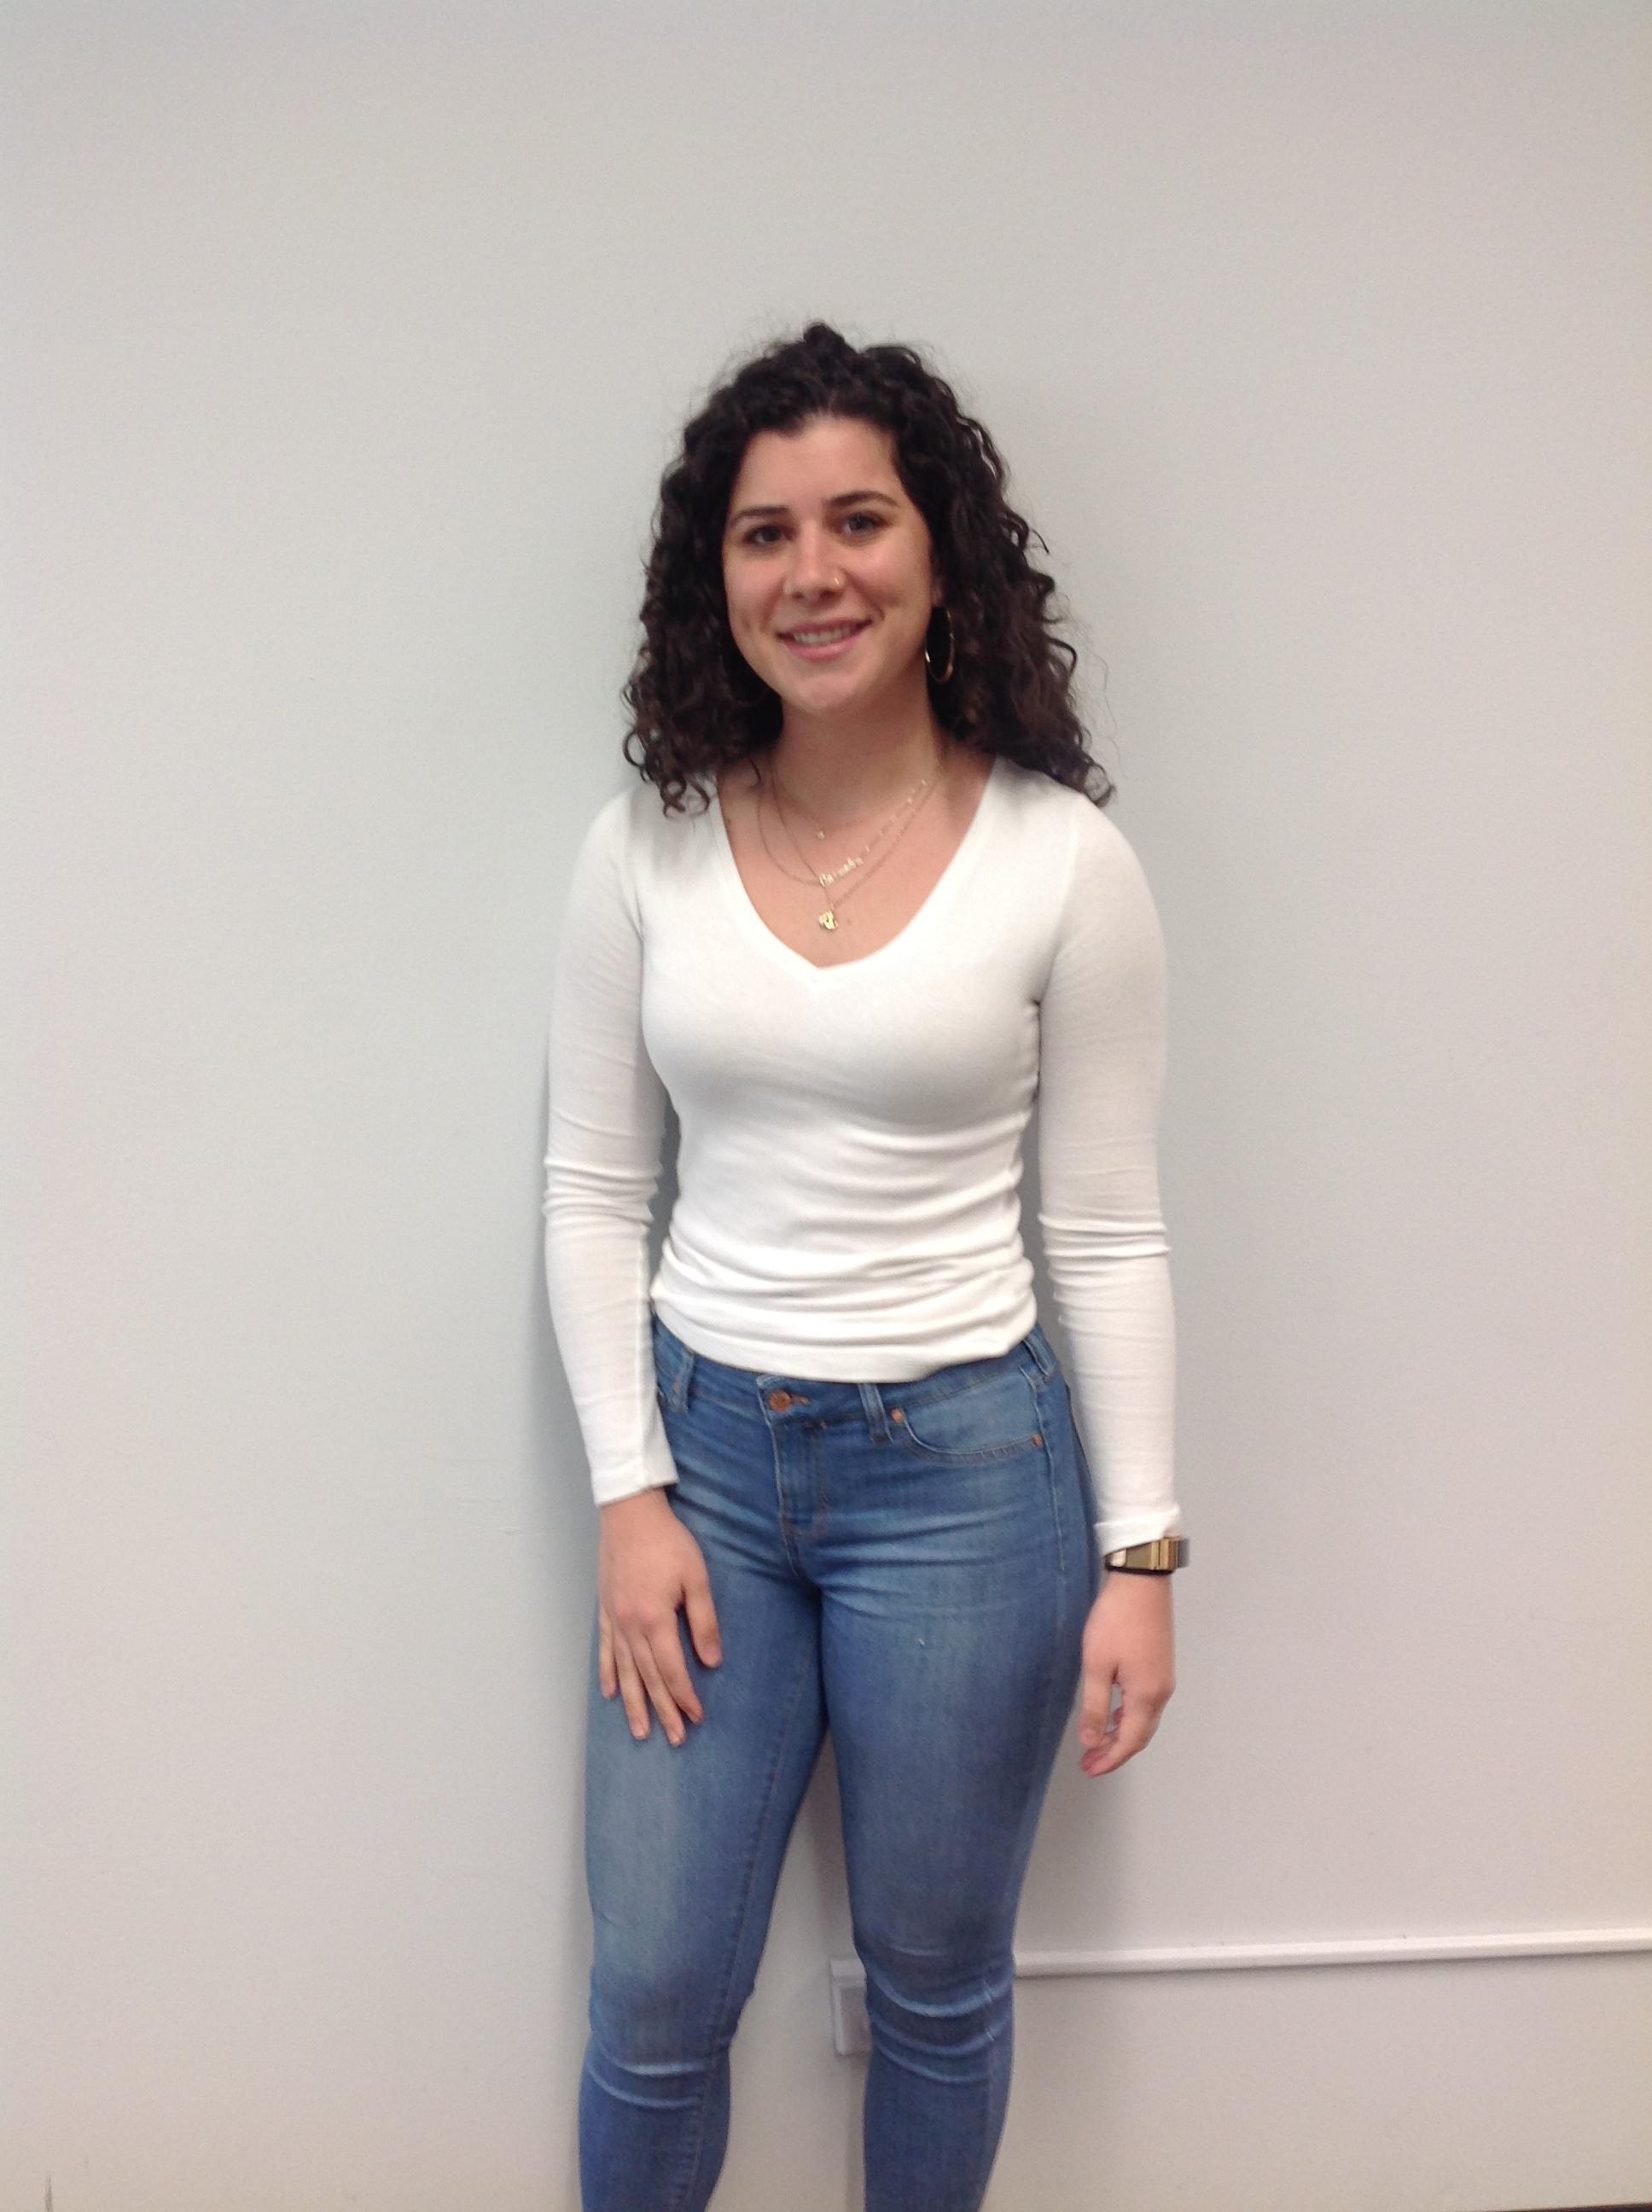 Cassandra Velazquez